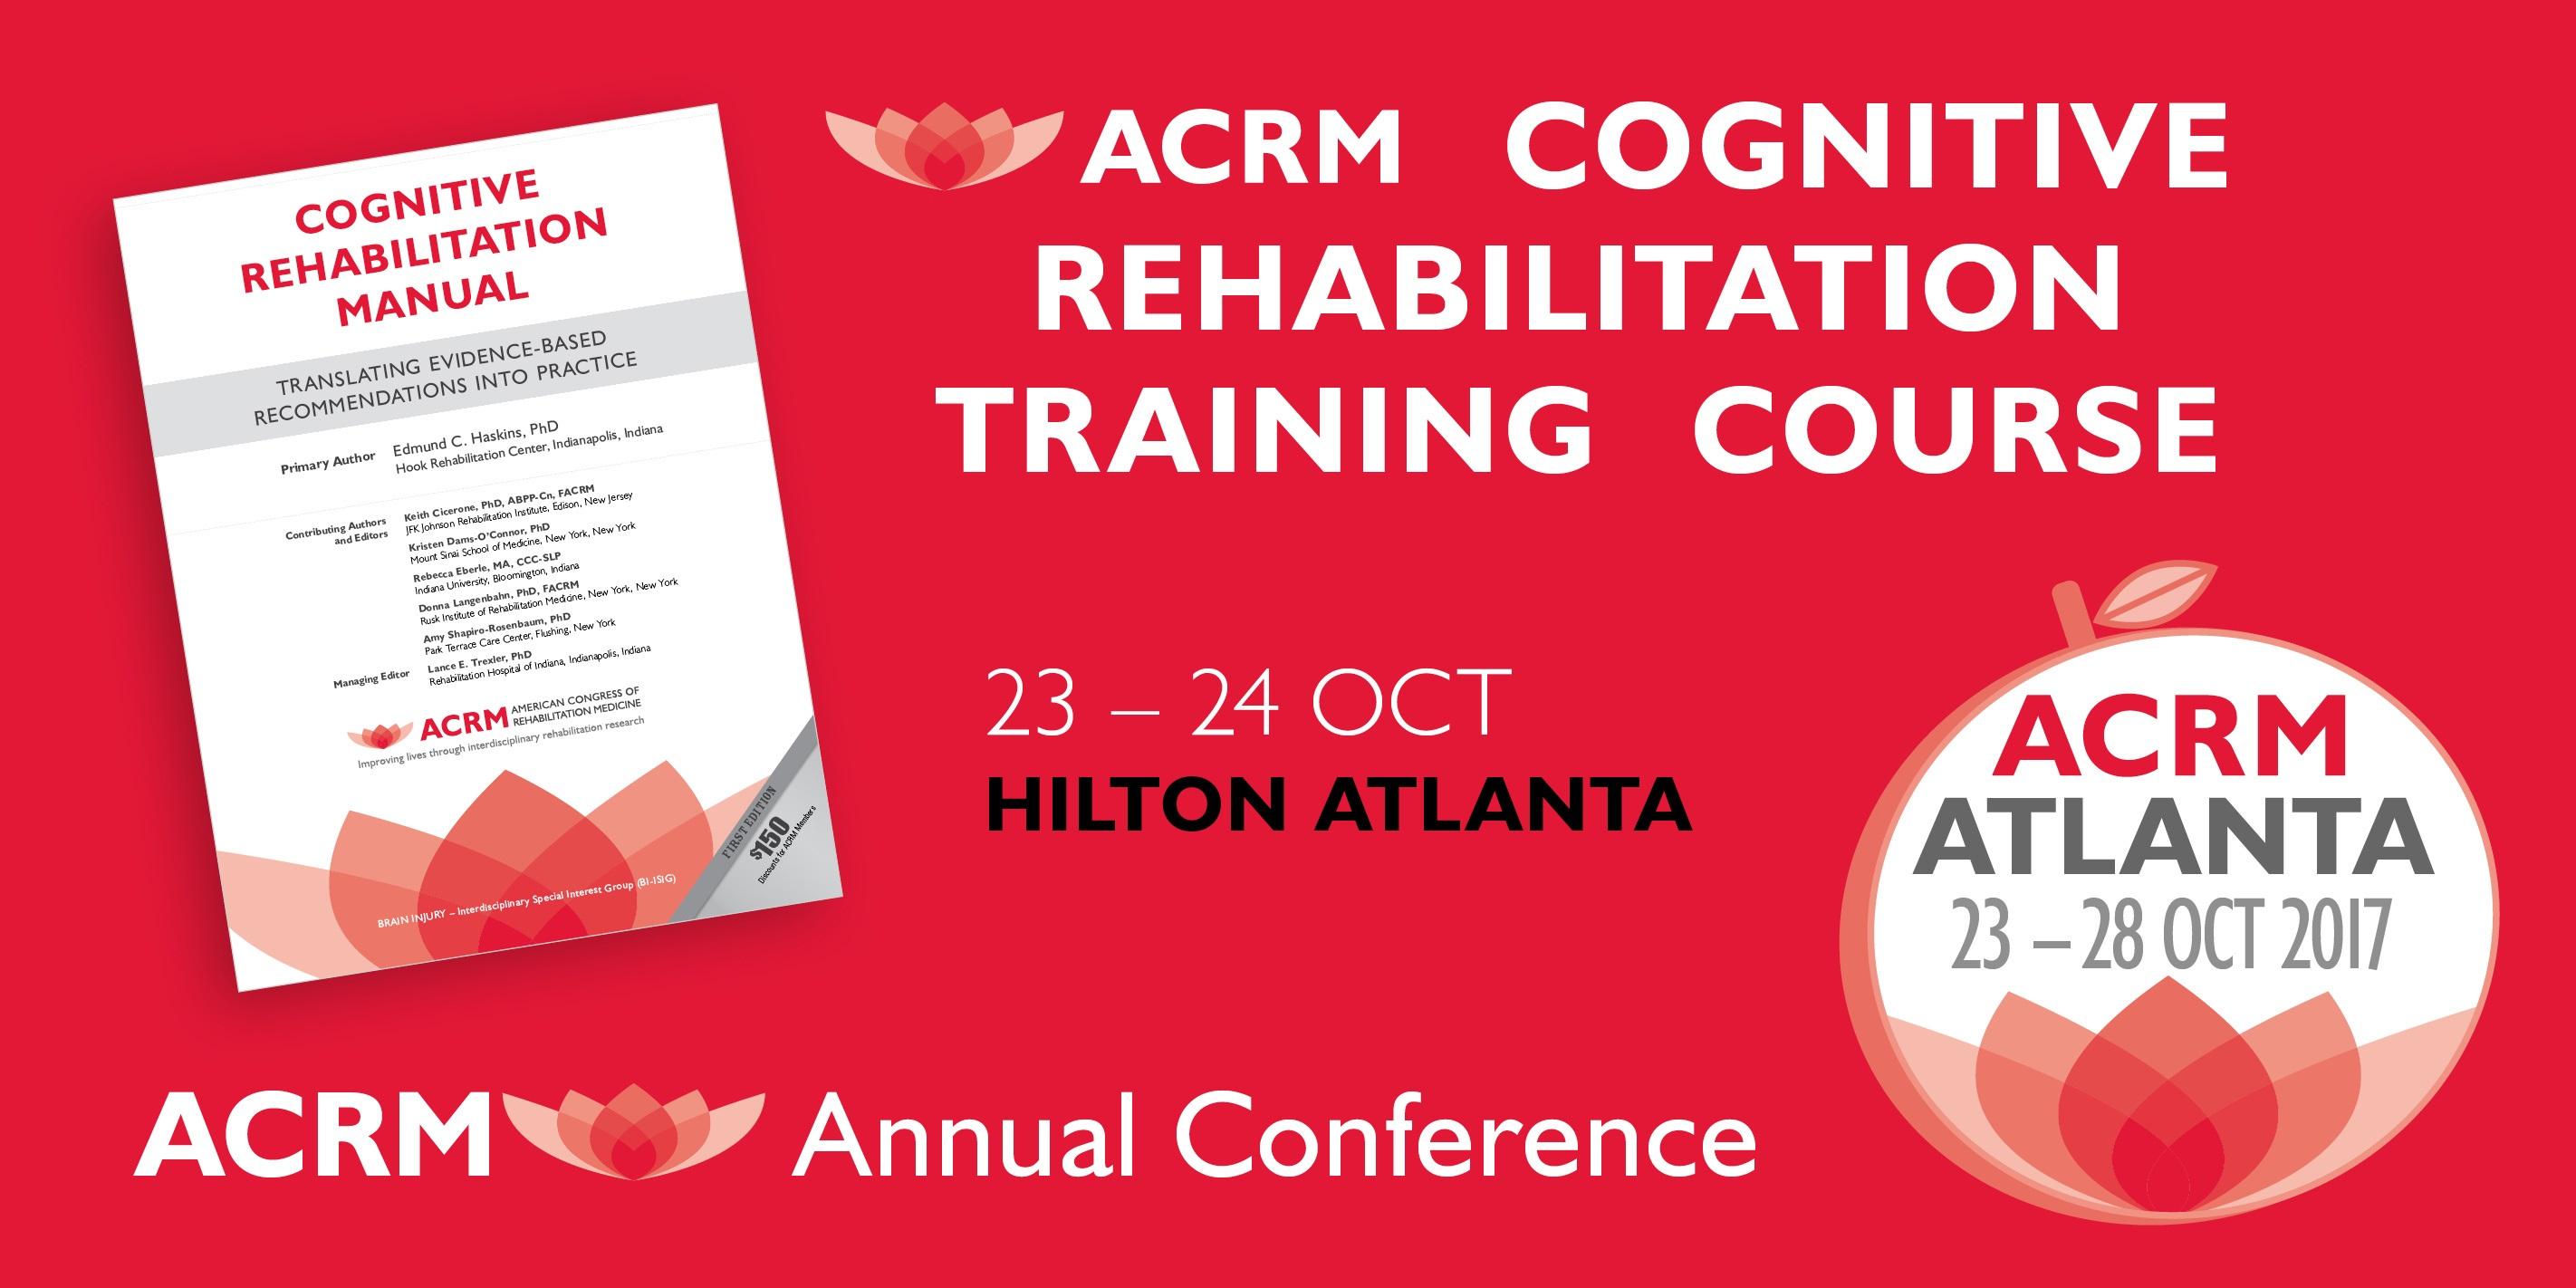 Cognitive Rehabilitation Training comes to Atlanta 23 - 24 Oct 2017